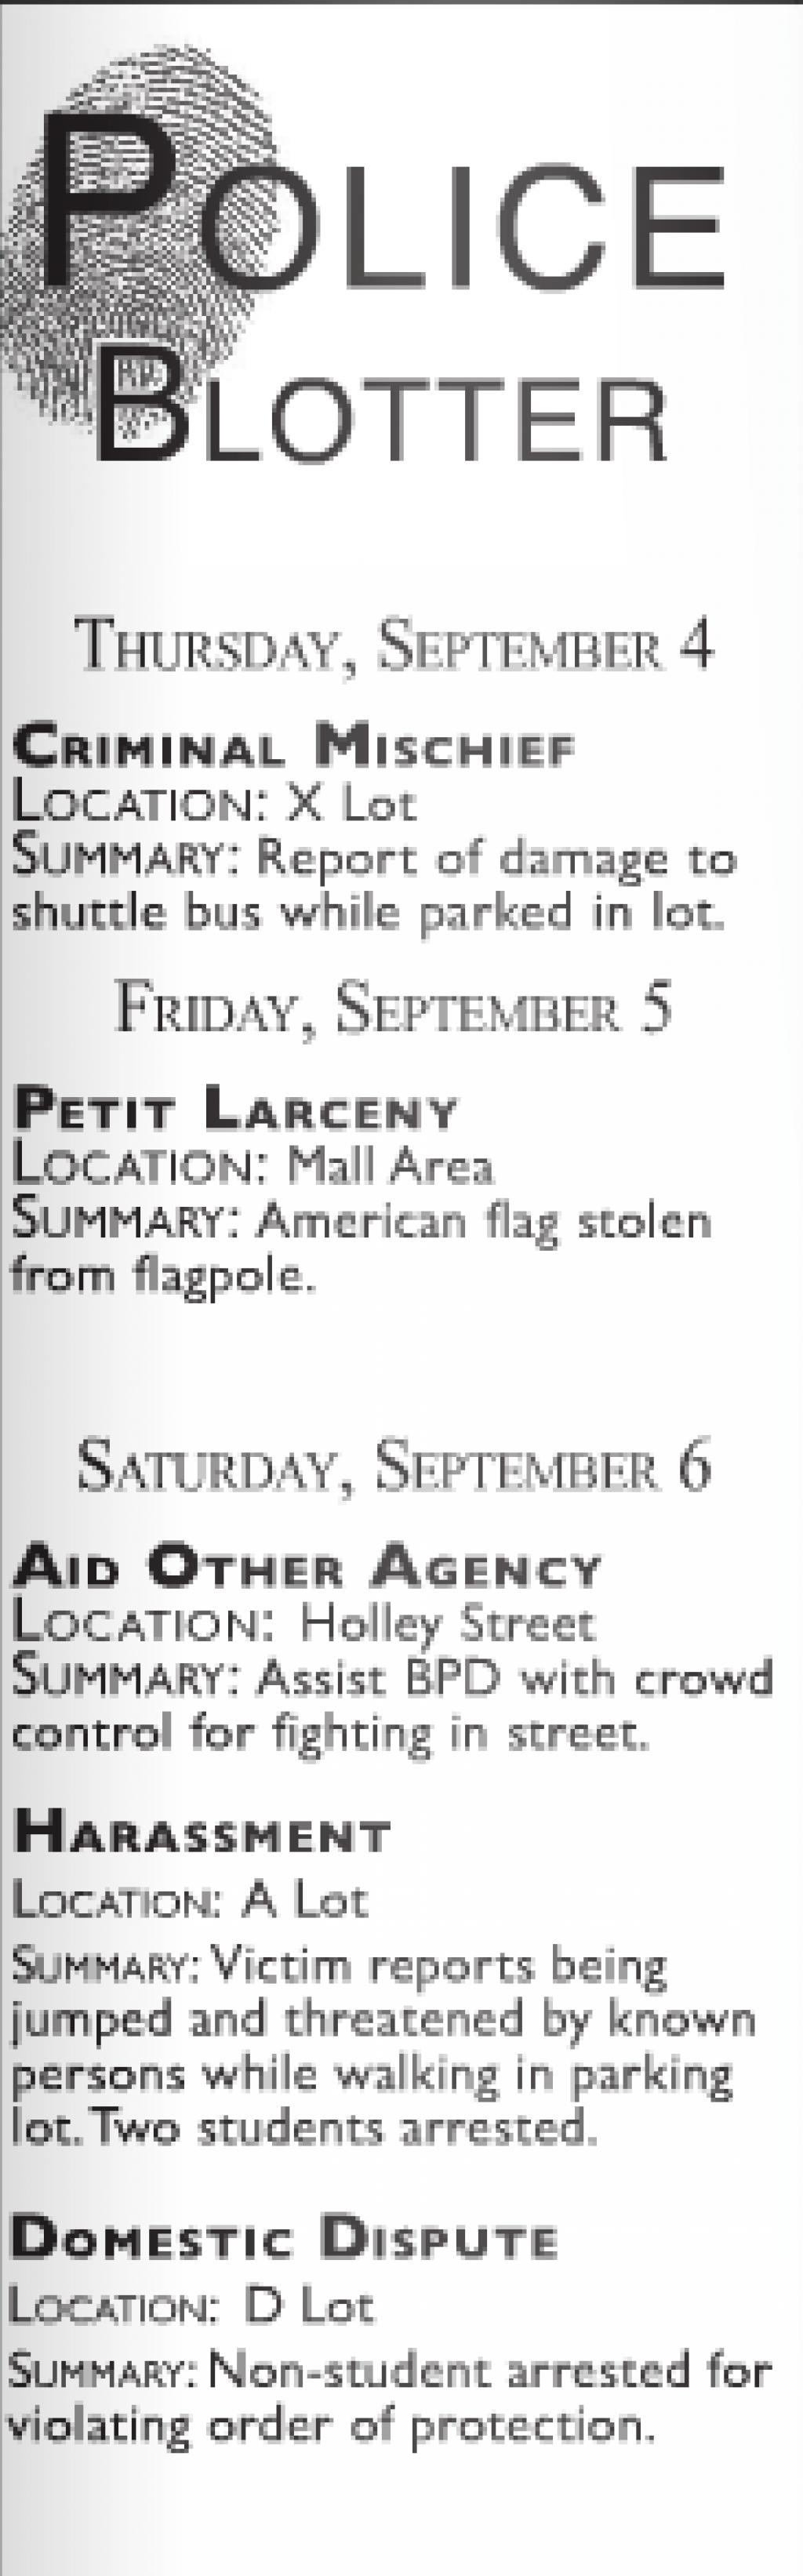 Police Blotter, 09/04/14 - 09/09/14